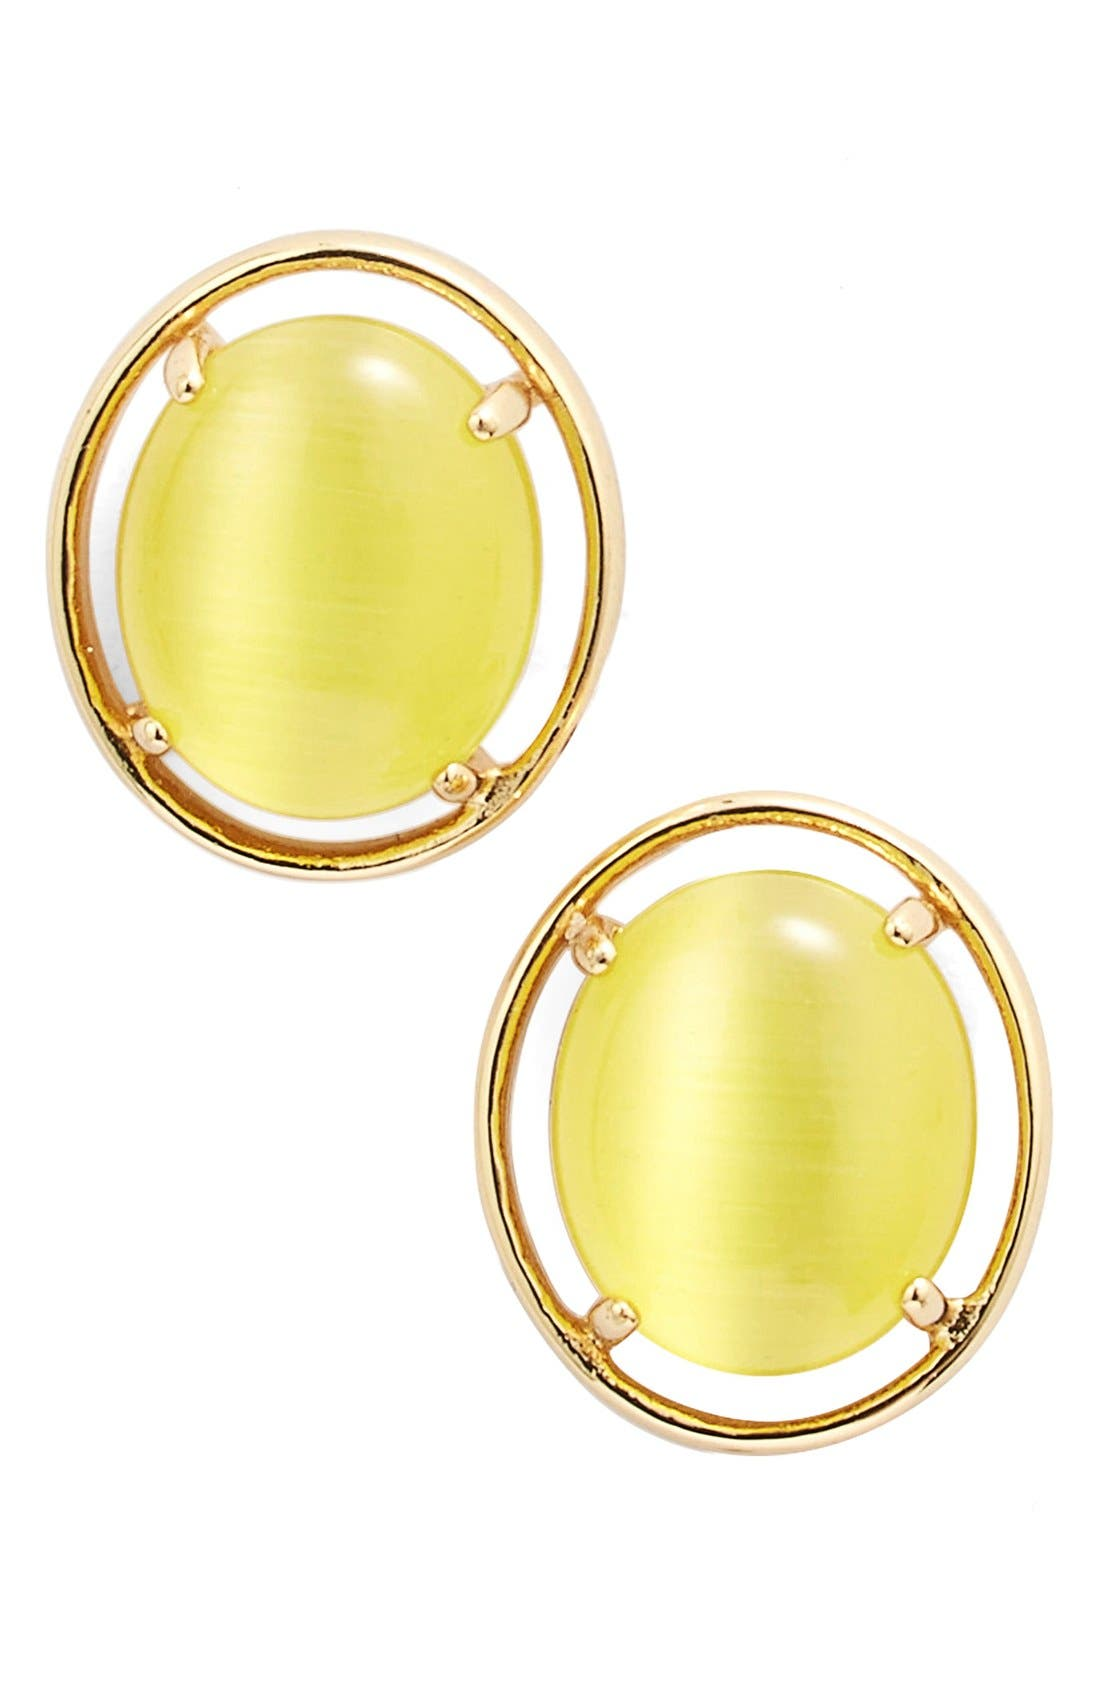 Alternate Image 1 Selected - kate spade new york open rim stud earrings